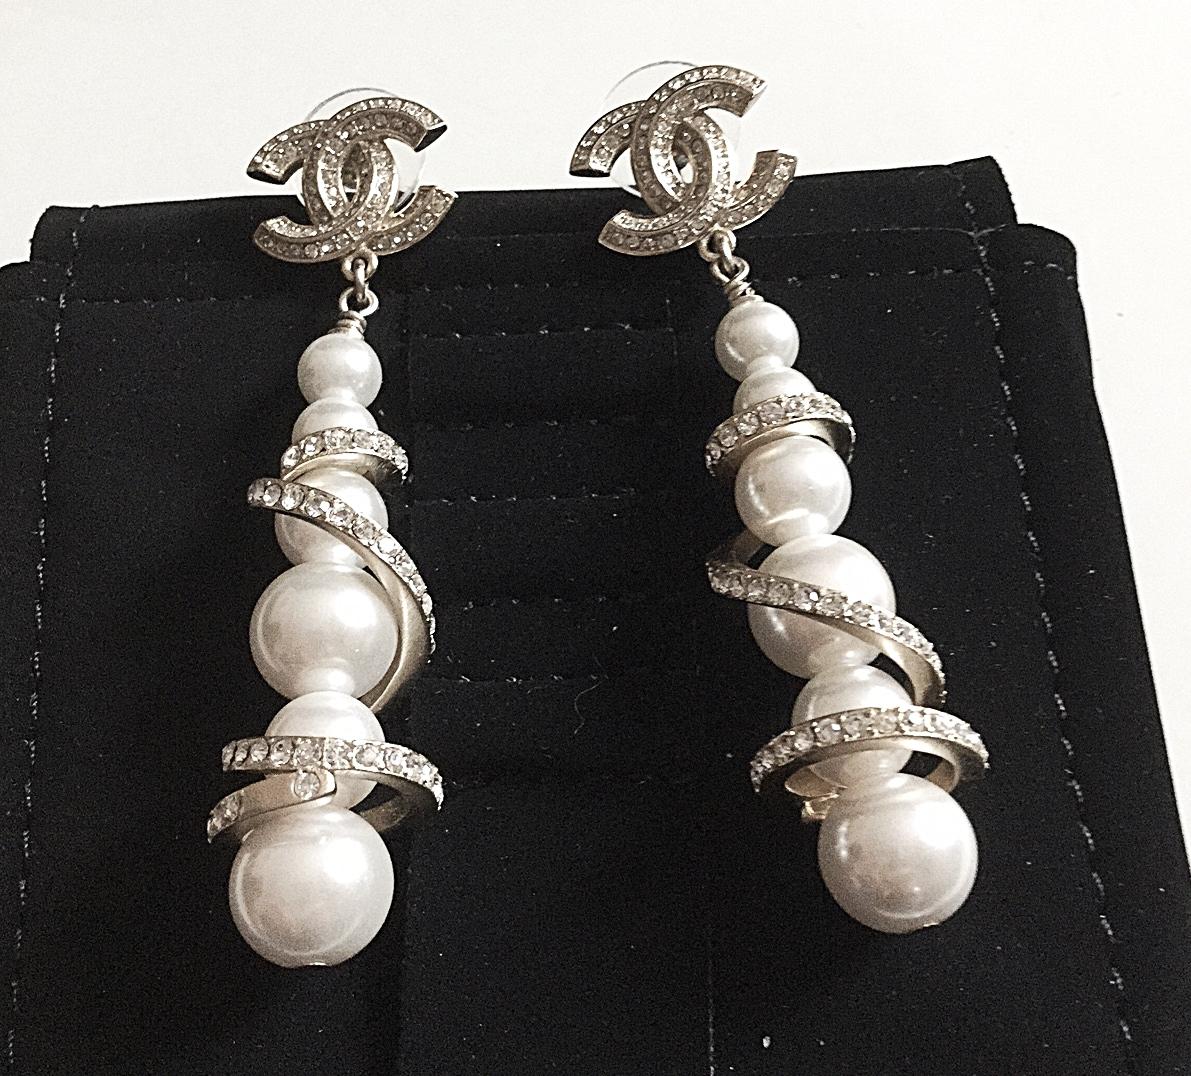 Chanel 2017 Runwsay Crystal Gold Swirl Pearl And 8 Similar Items